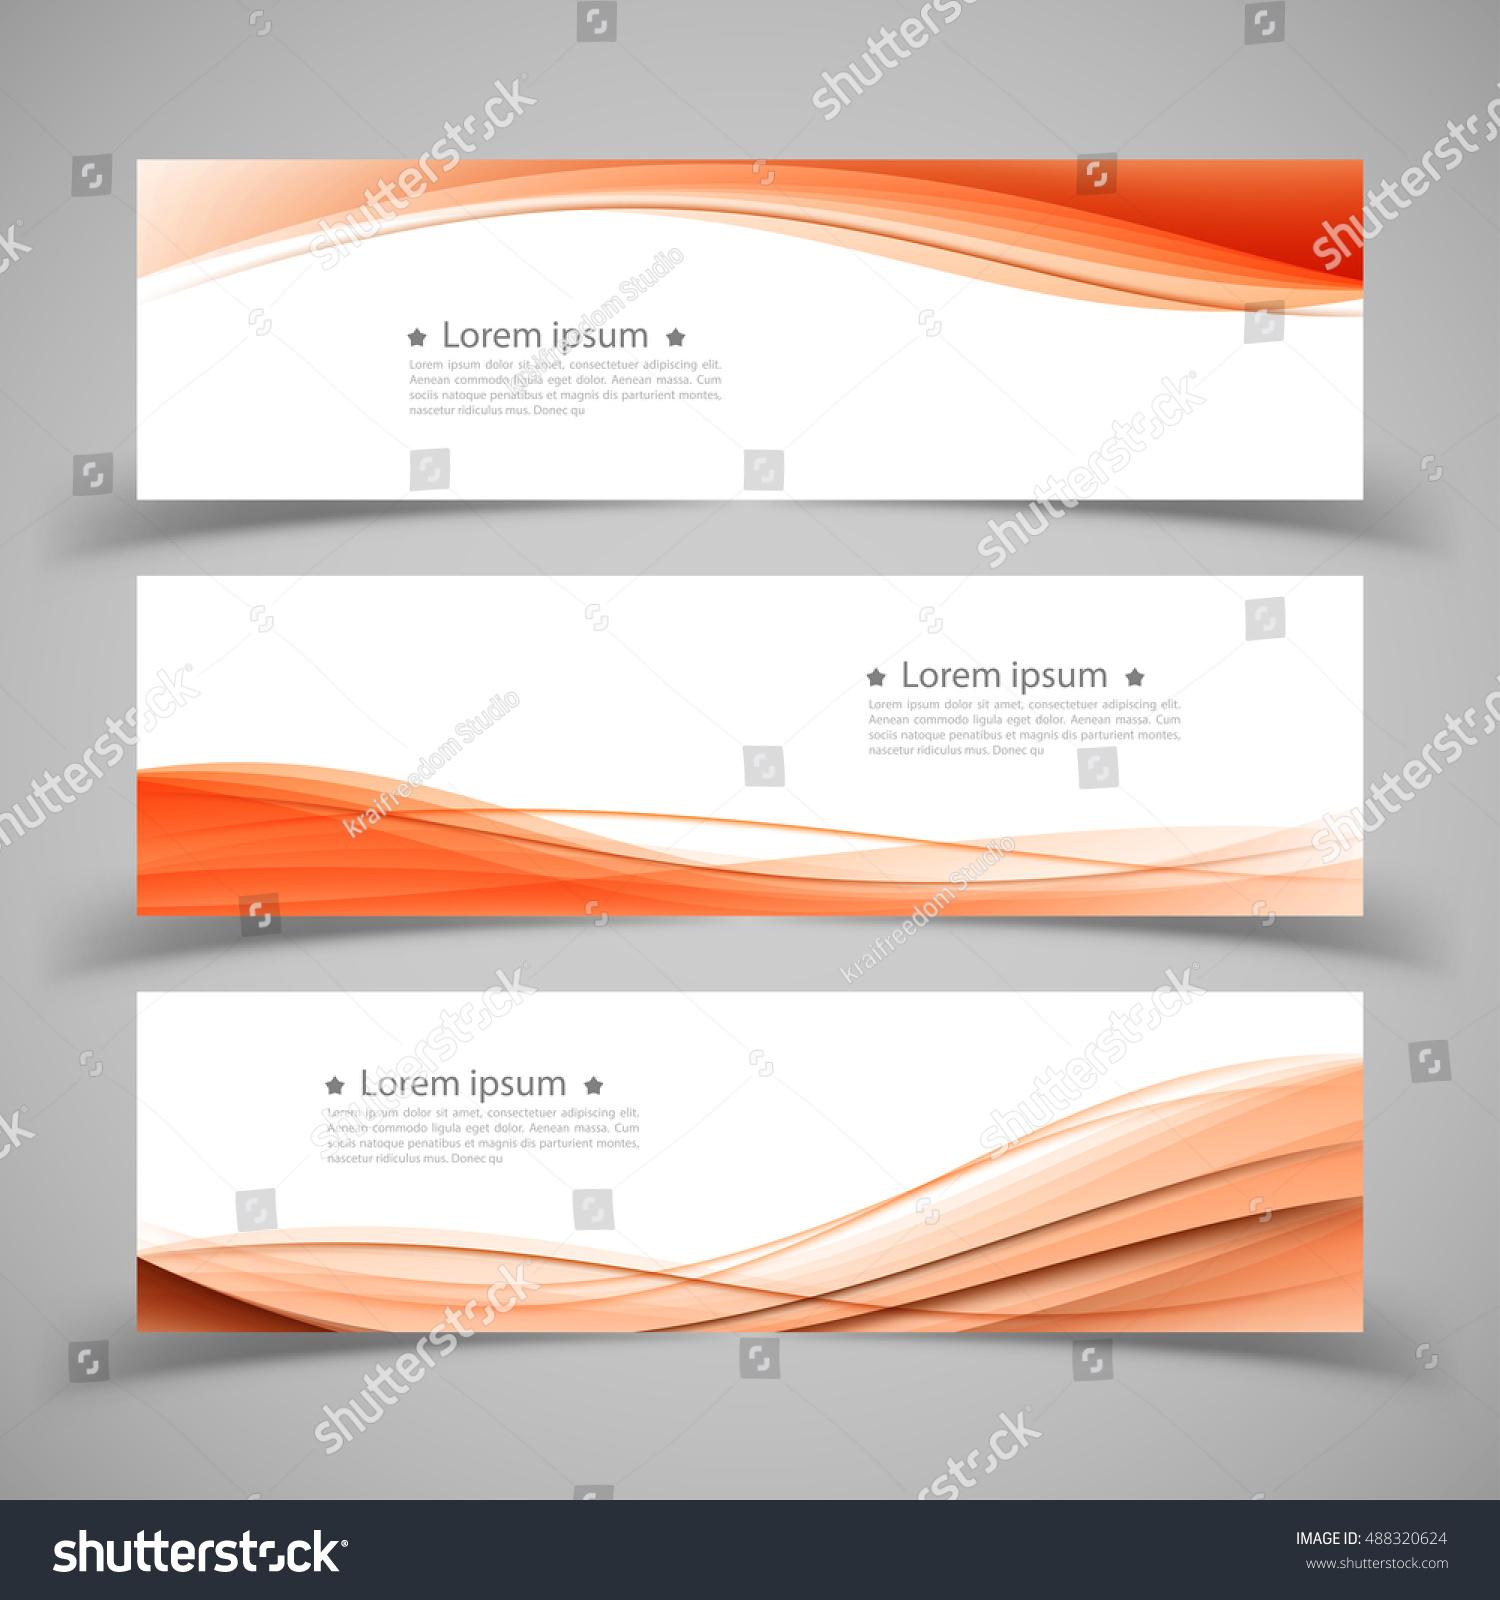 banner templates